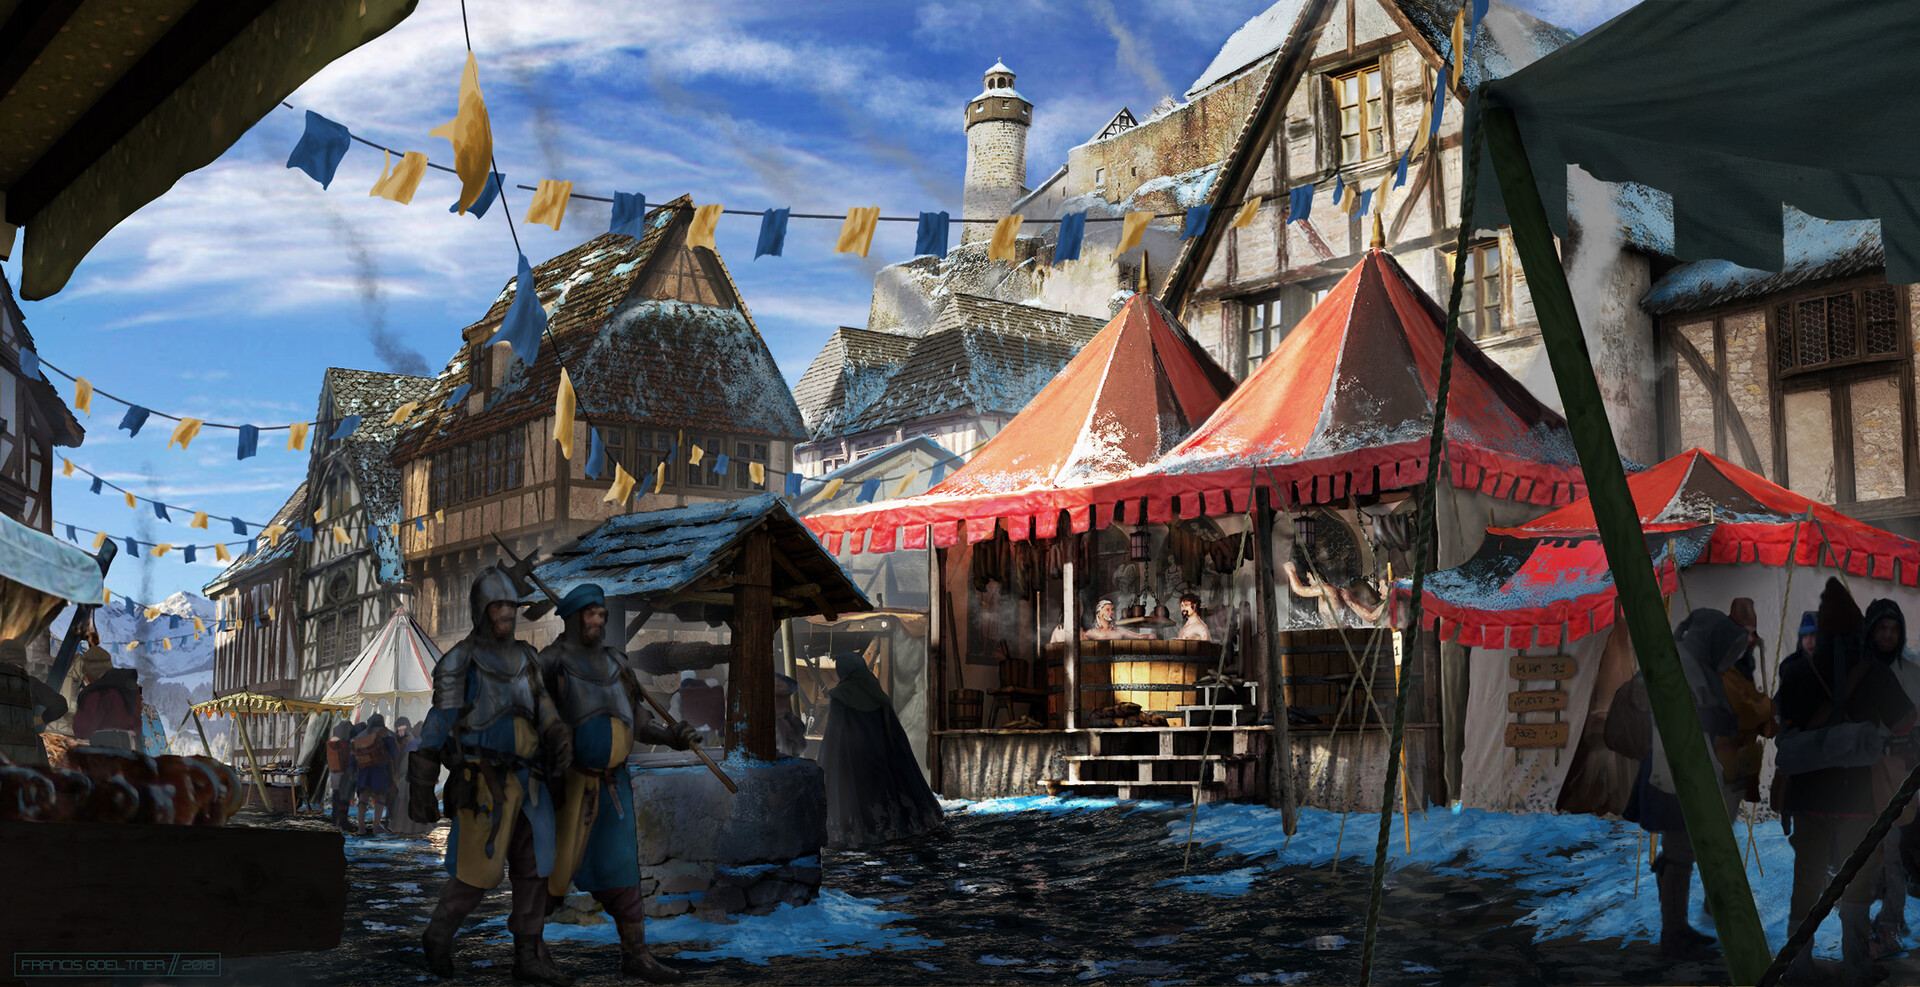 Francis goeltner medievalfantasy travelingbathhouse03 wip07 m